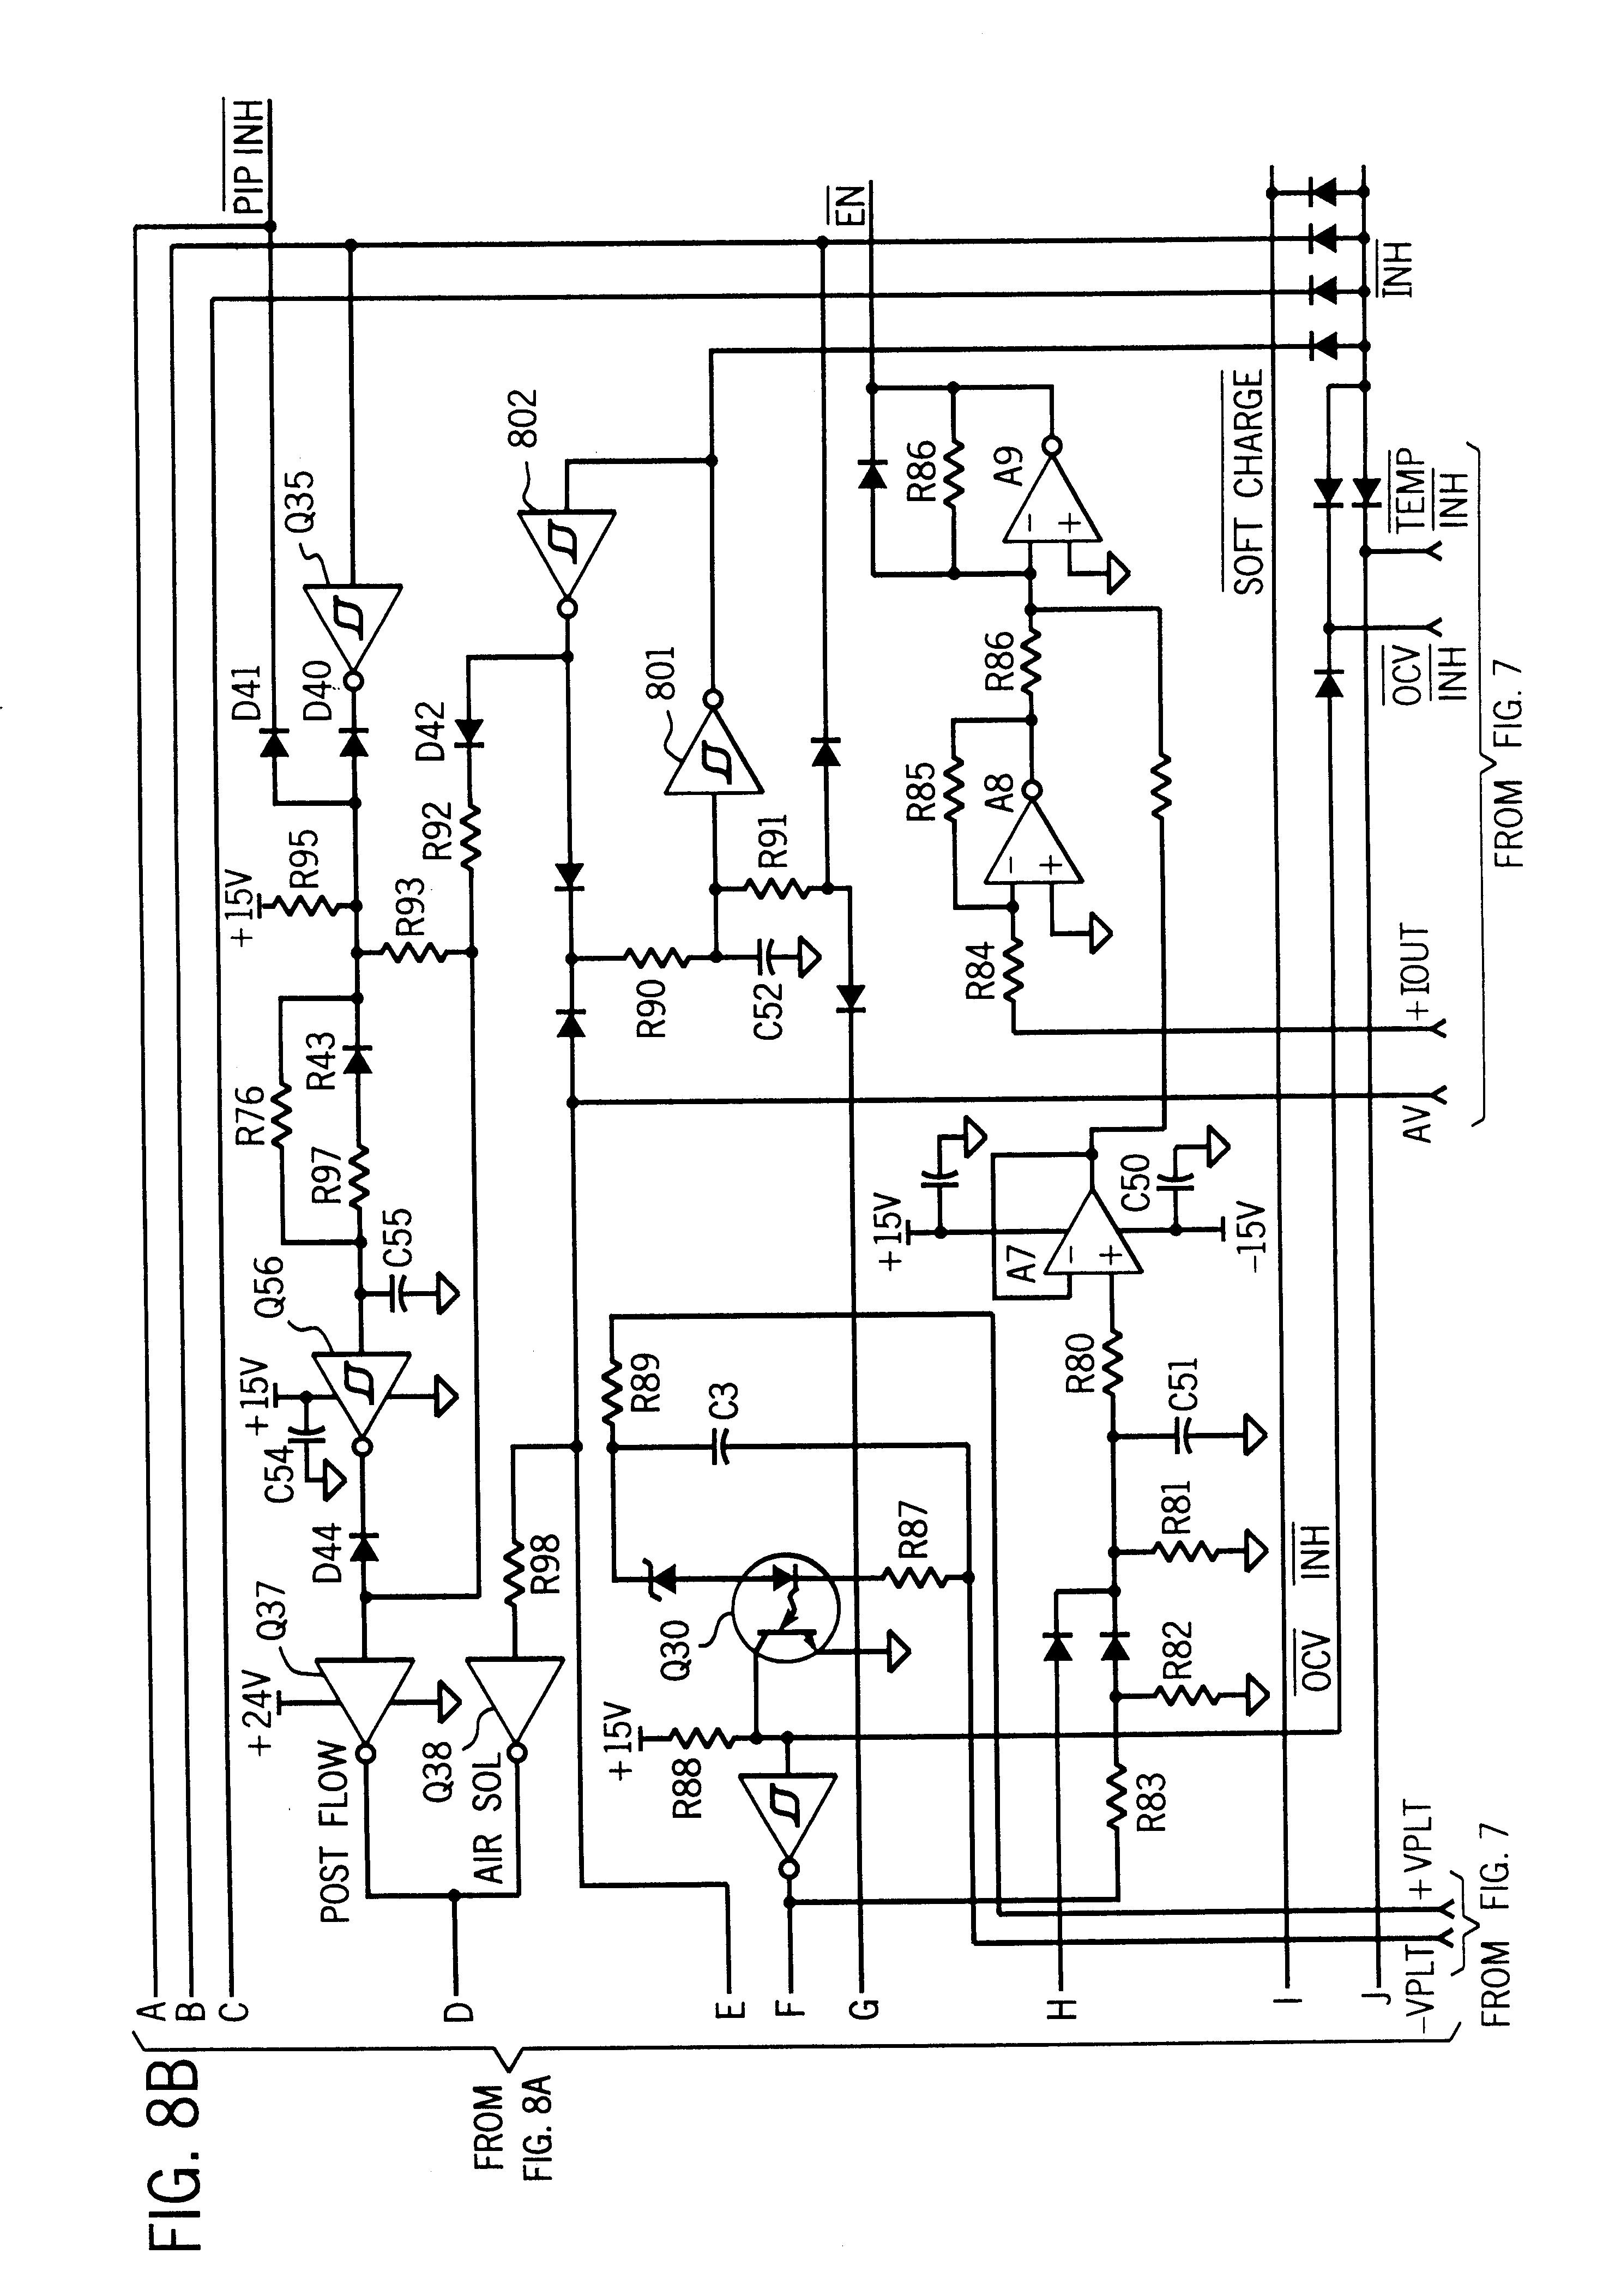 plasma cutter circuit diagram   29 wiring diagram images